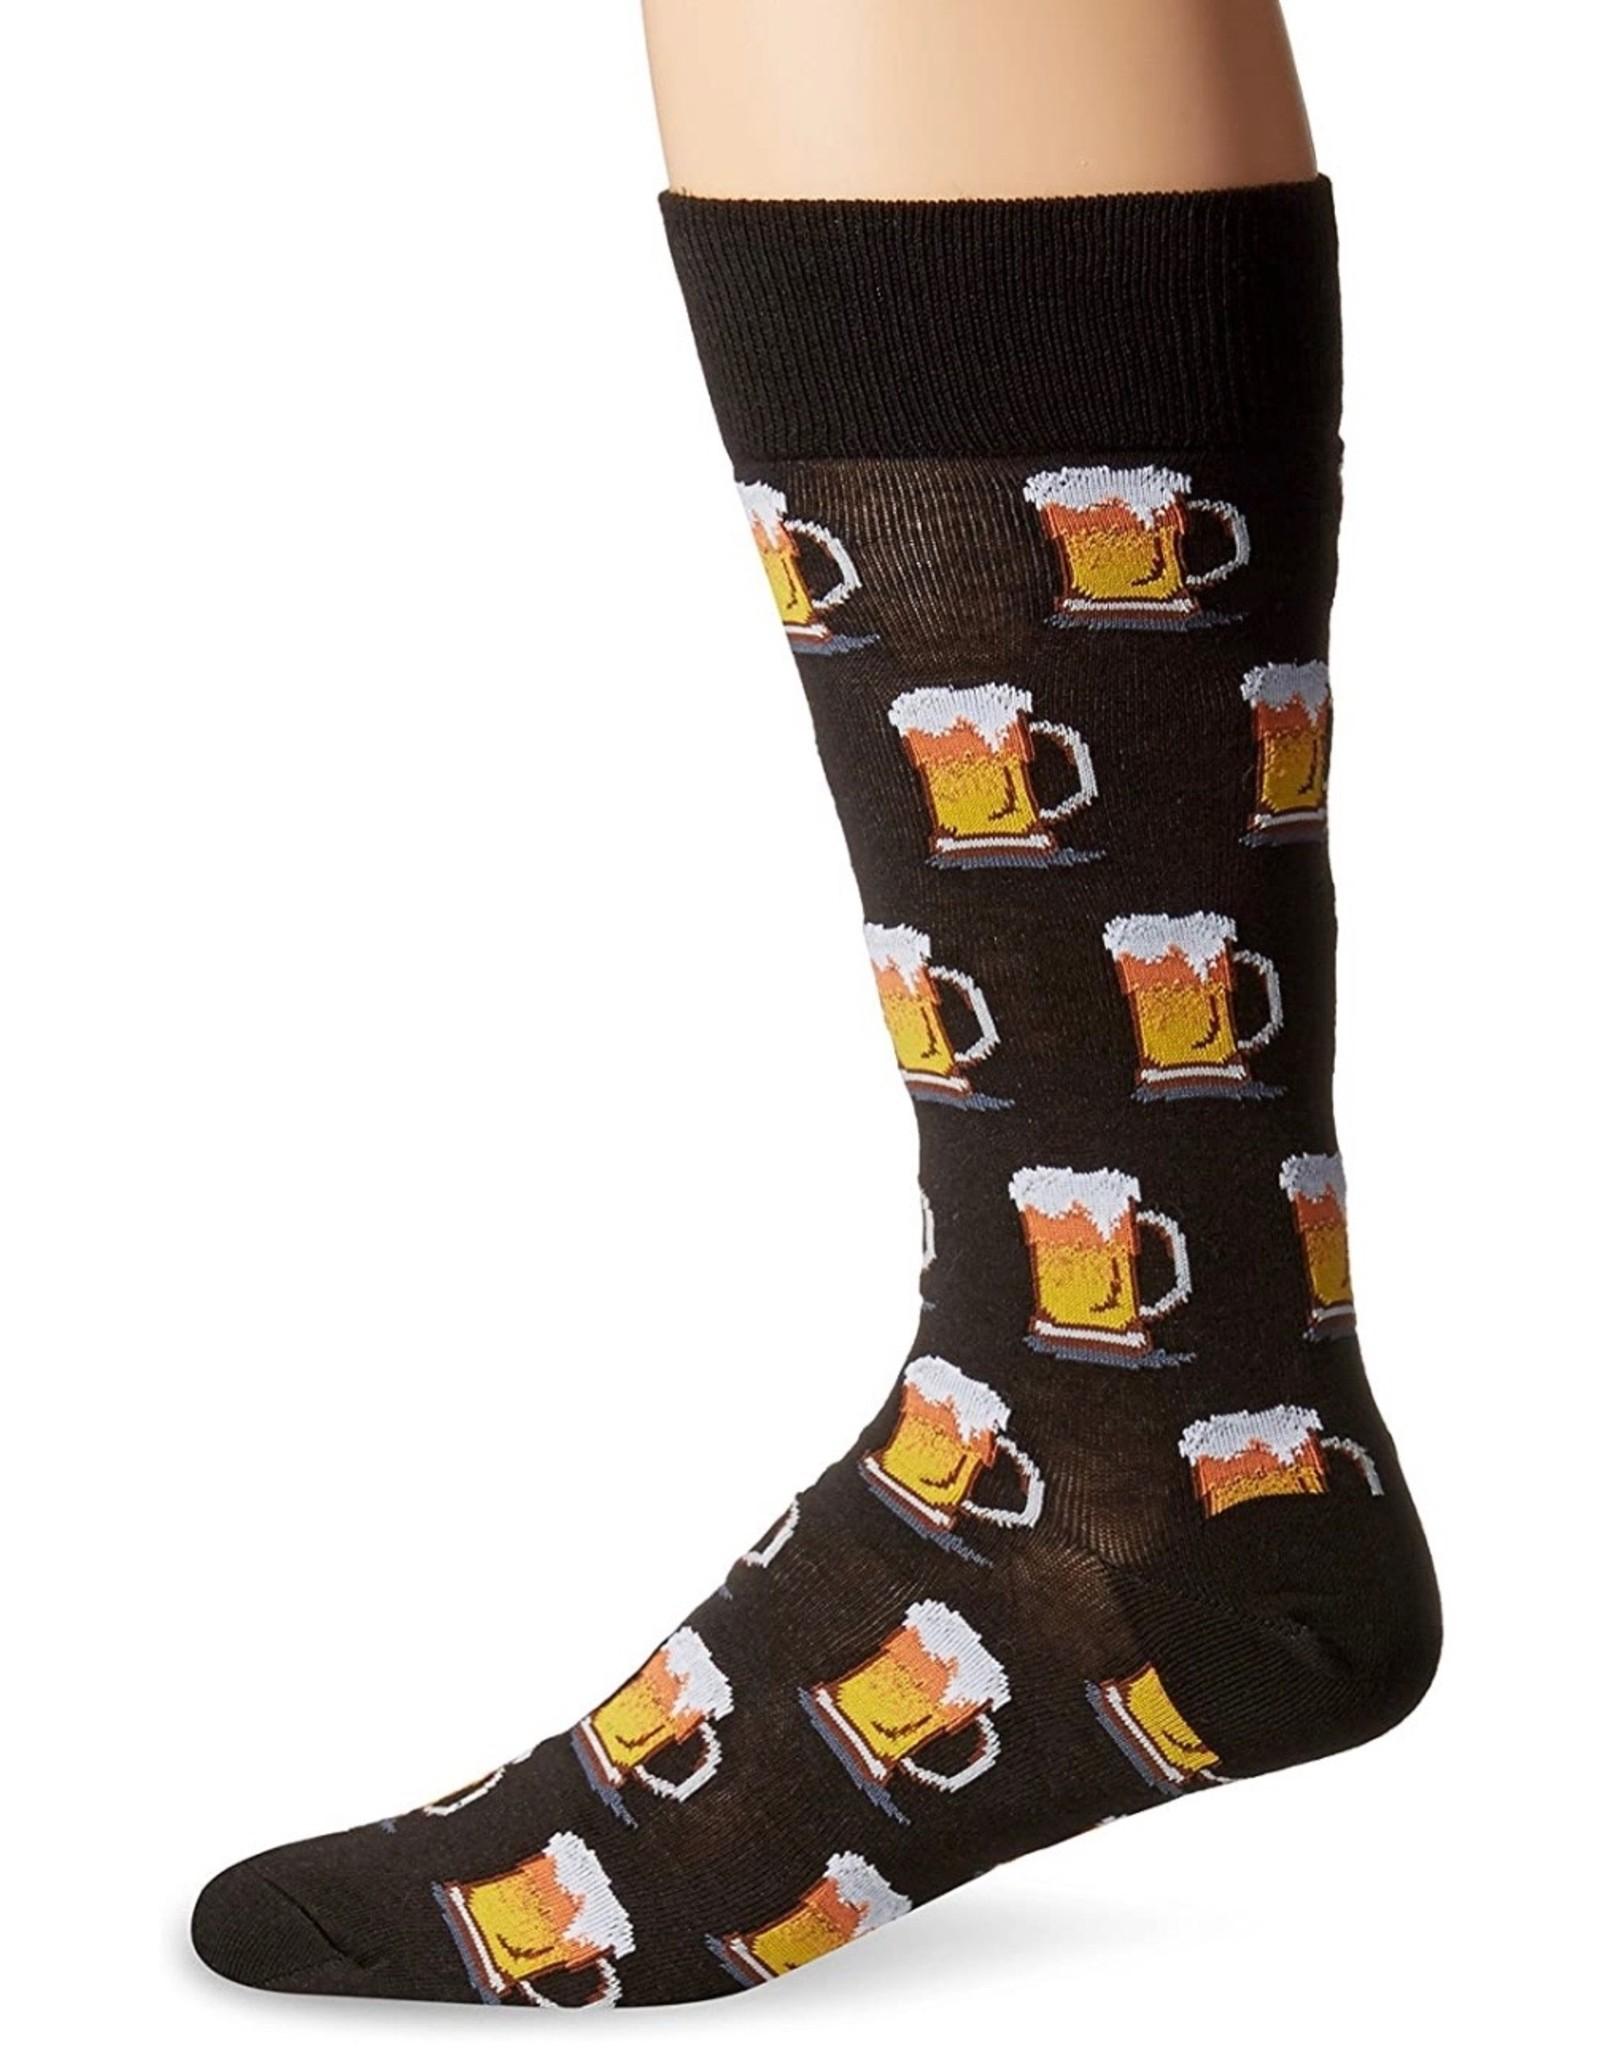 Hotsox Hotsox Men's Beer Crew Socks HM100506